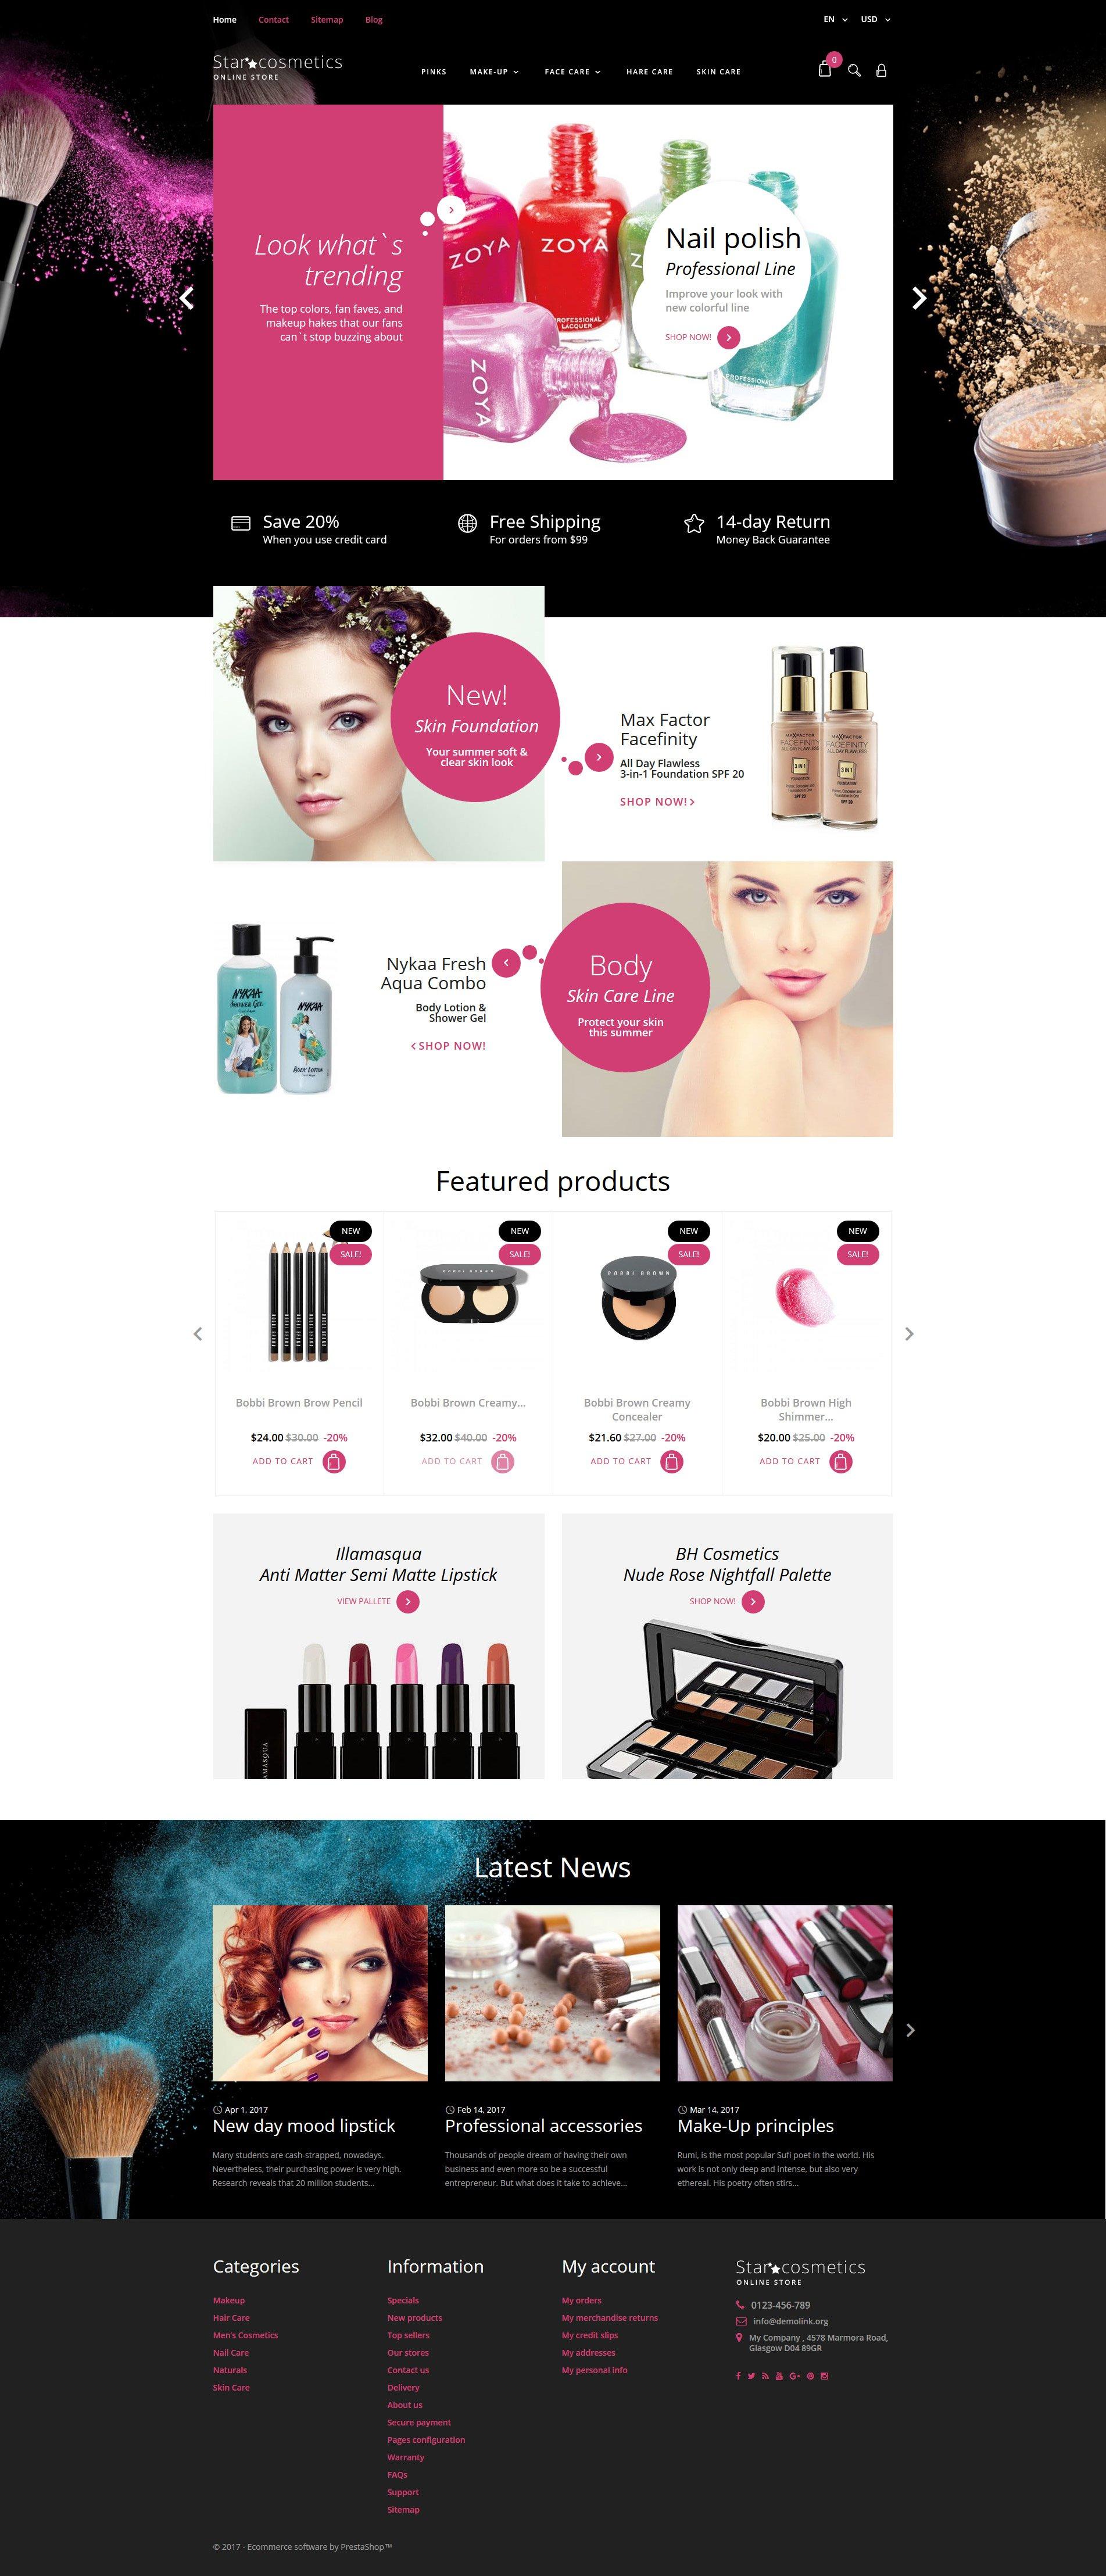 Responsywny szablon PrestaShop Star Cosmetics - Beauty Items Responsive #63545 - zrzut ekranu